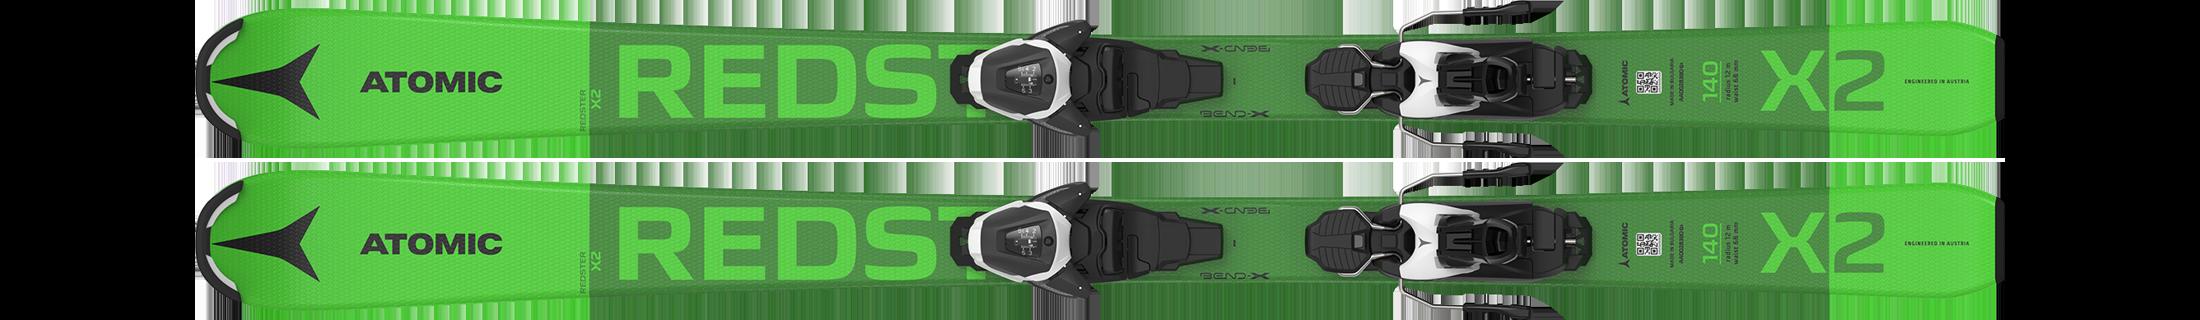 REDSTER X2 130-150 + L 6 GW